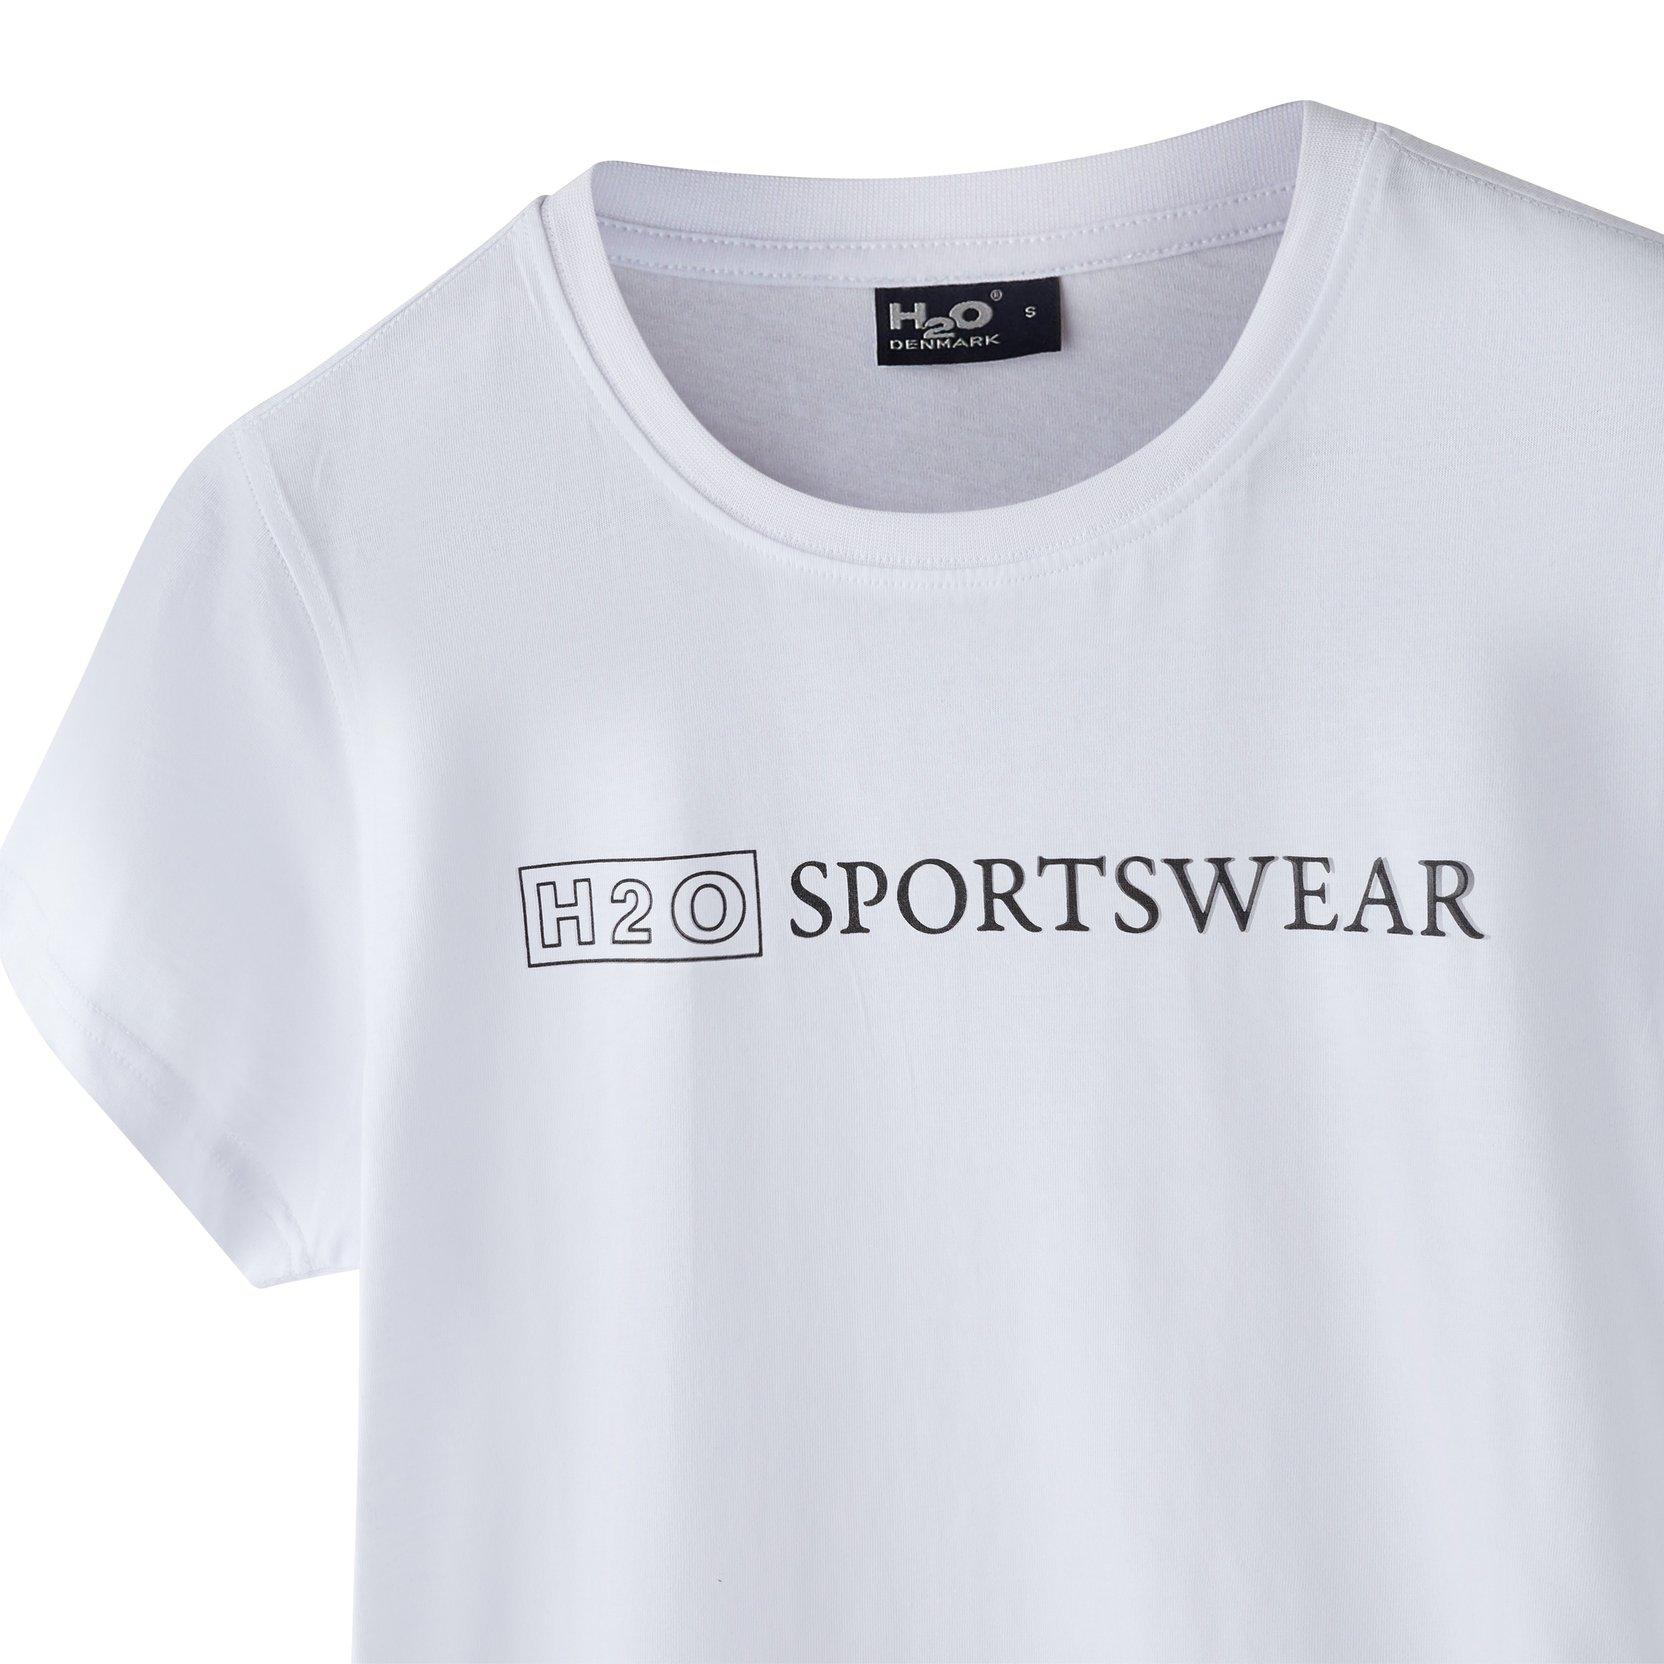 H2O Birkholm t-shirt, white, x-small